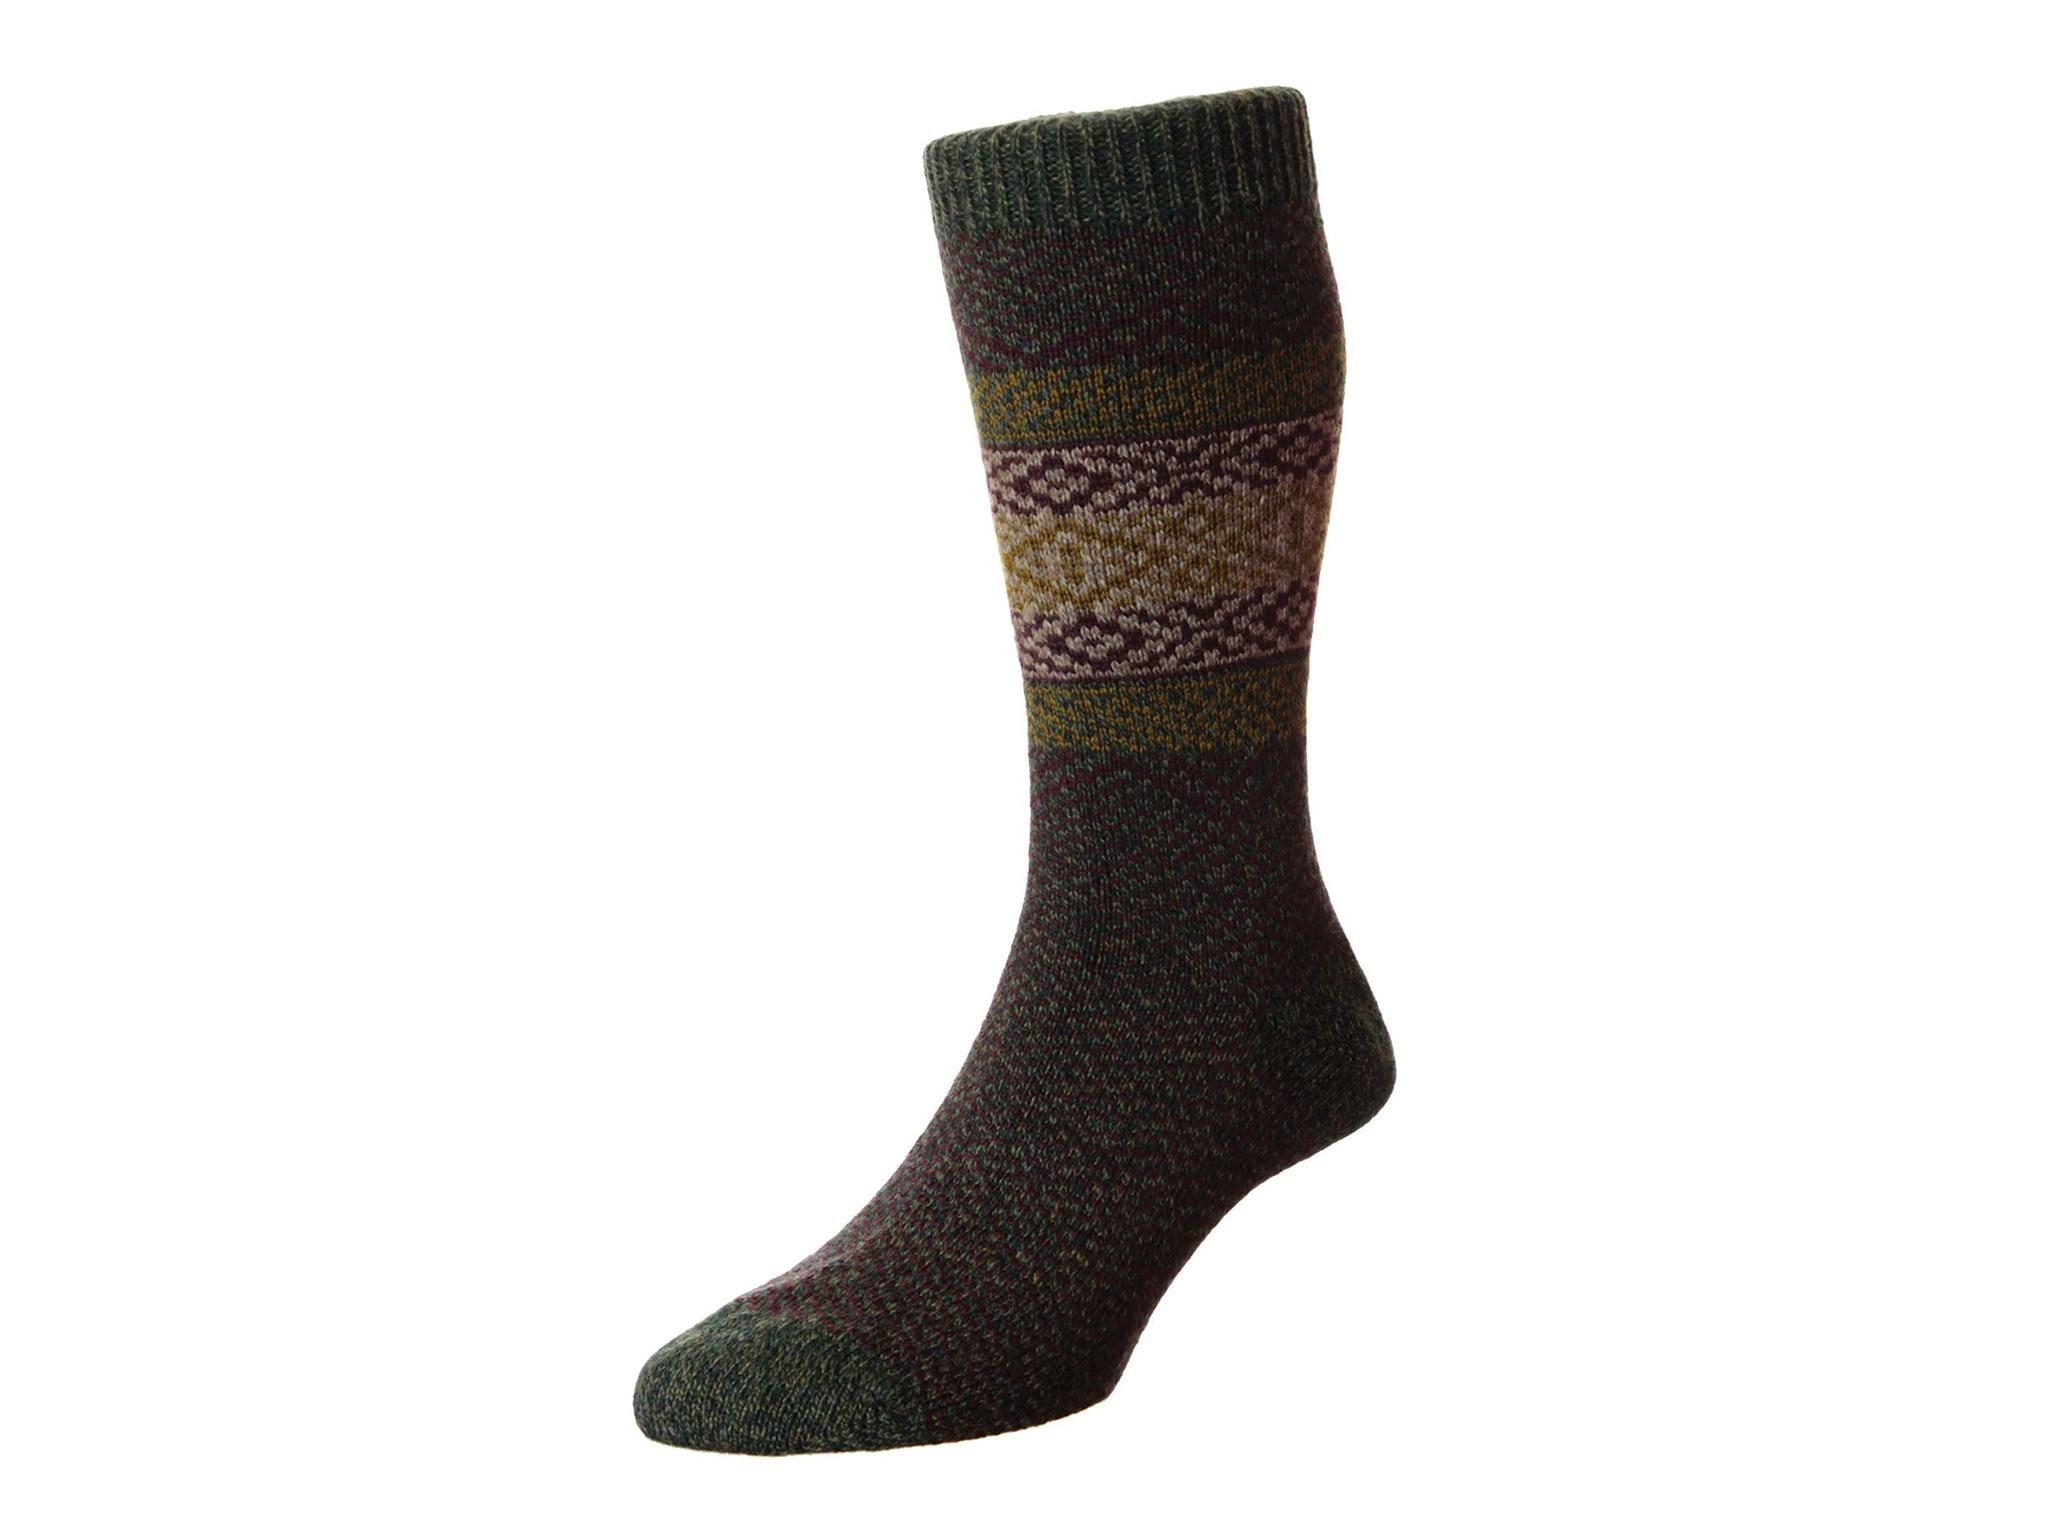 10 best men's socks | The Independent